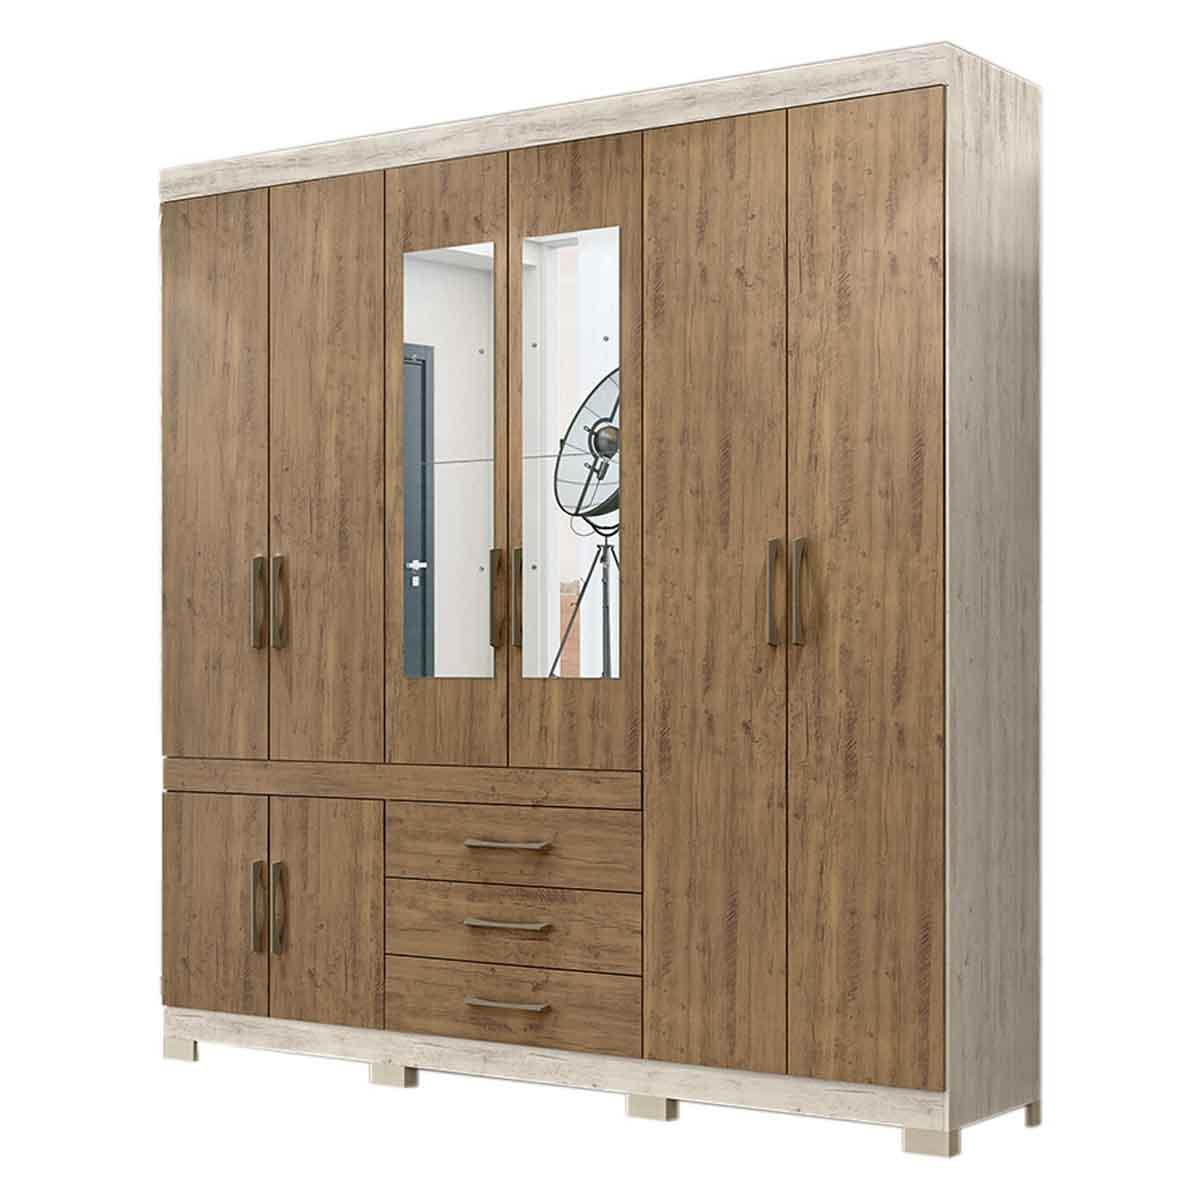 Armario Closet Moderno Espejo 4 Puertas Doble Vista 3Cajones